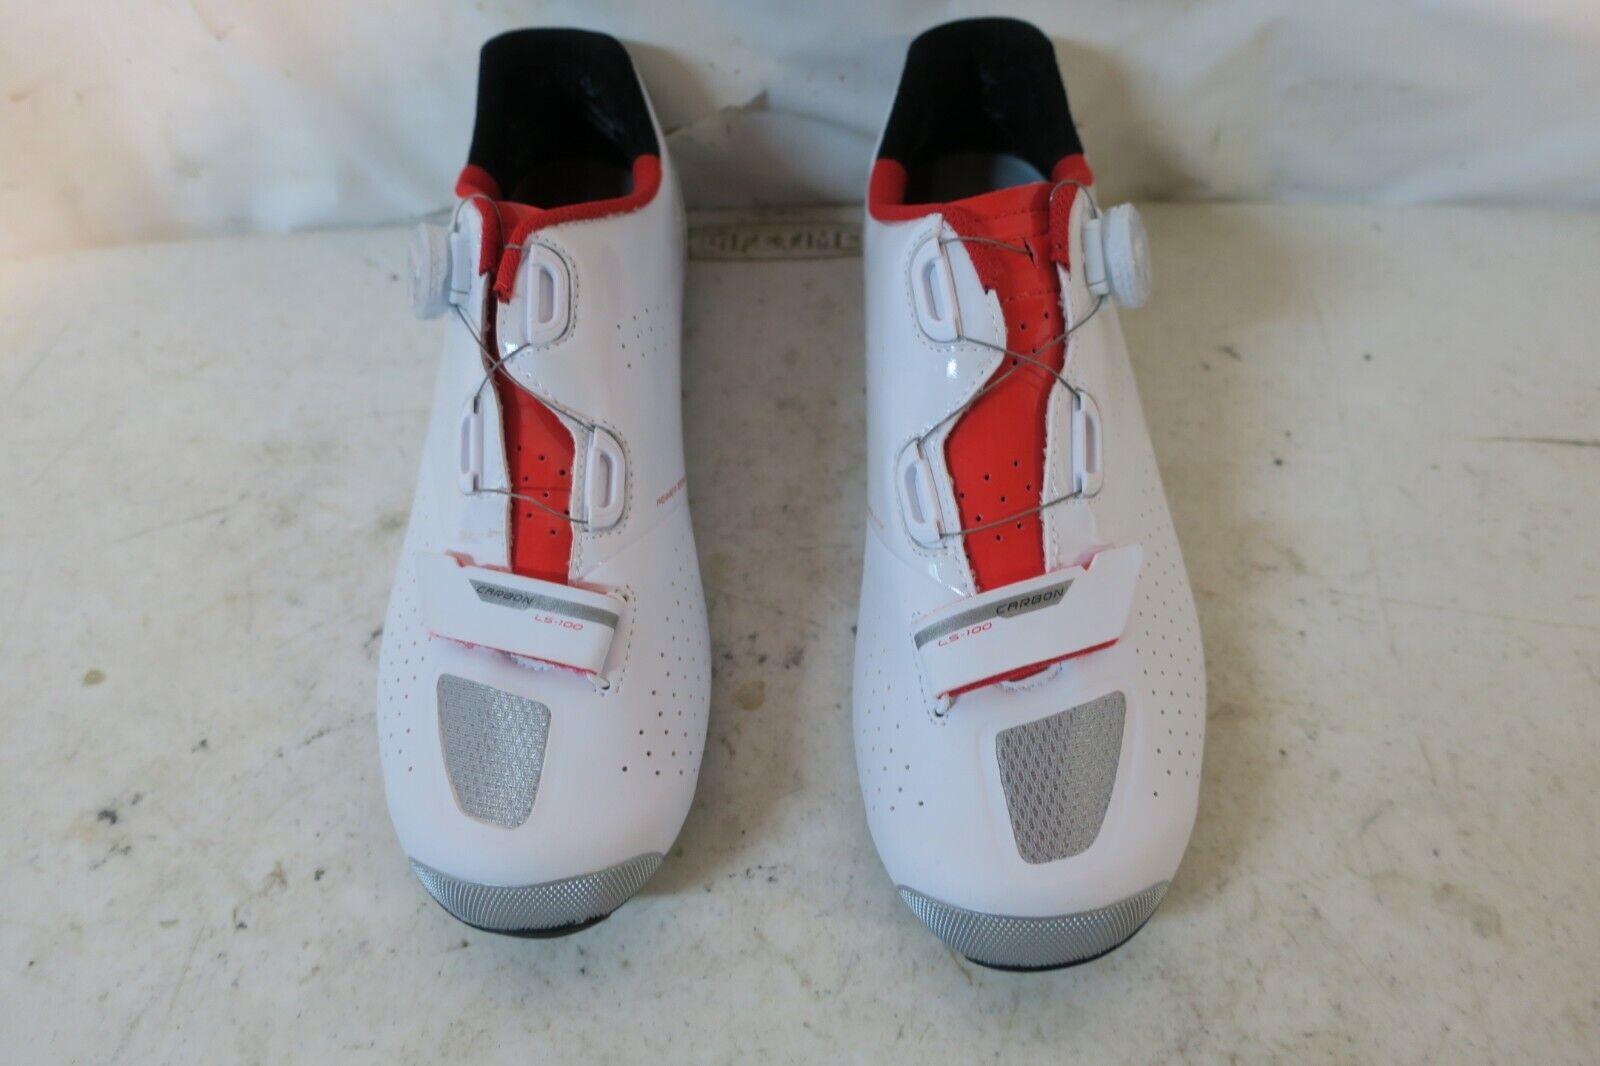 Calzado ciclista masculino 43,5 US 9,75 blancoo   jengibre rojo